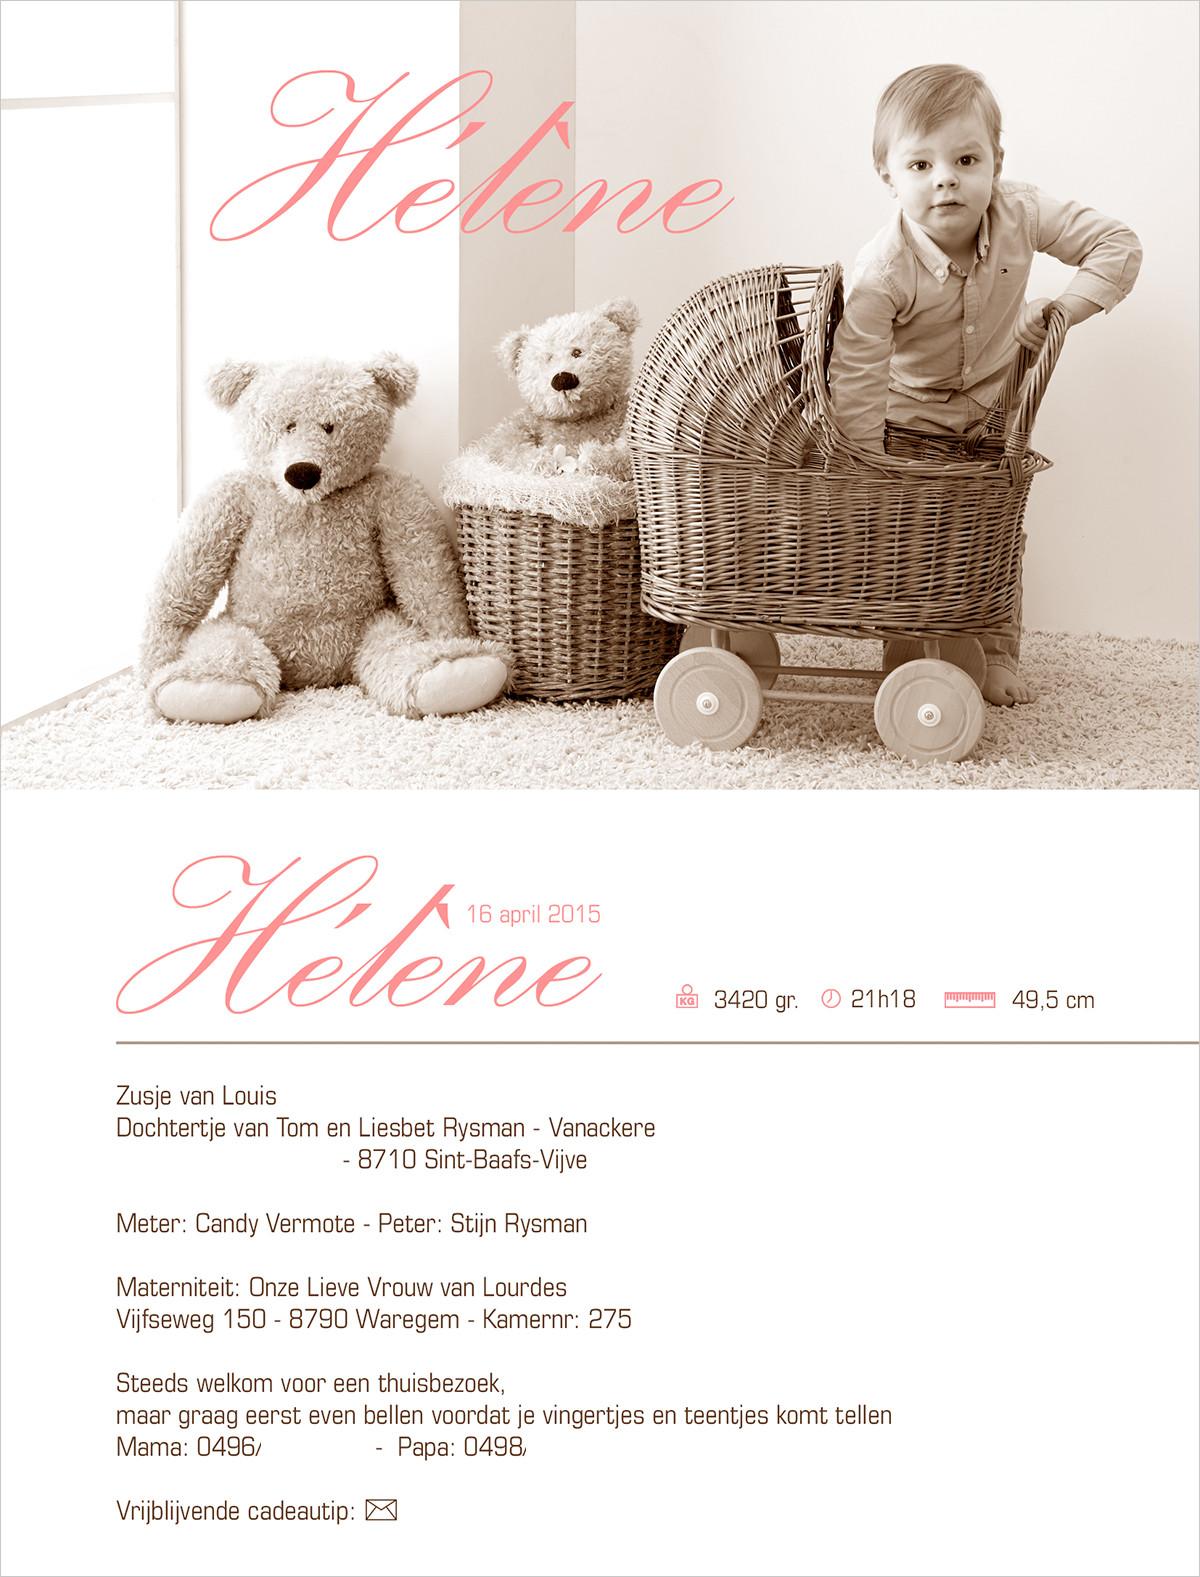 Geboortekaartje met foto van Helene